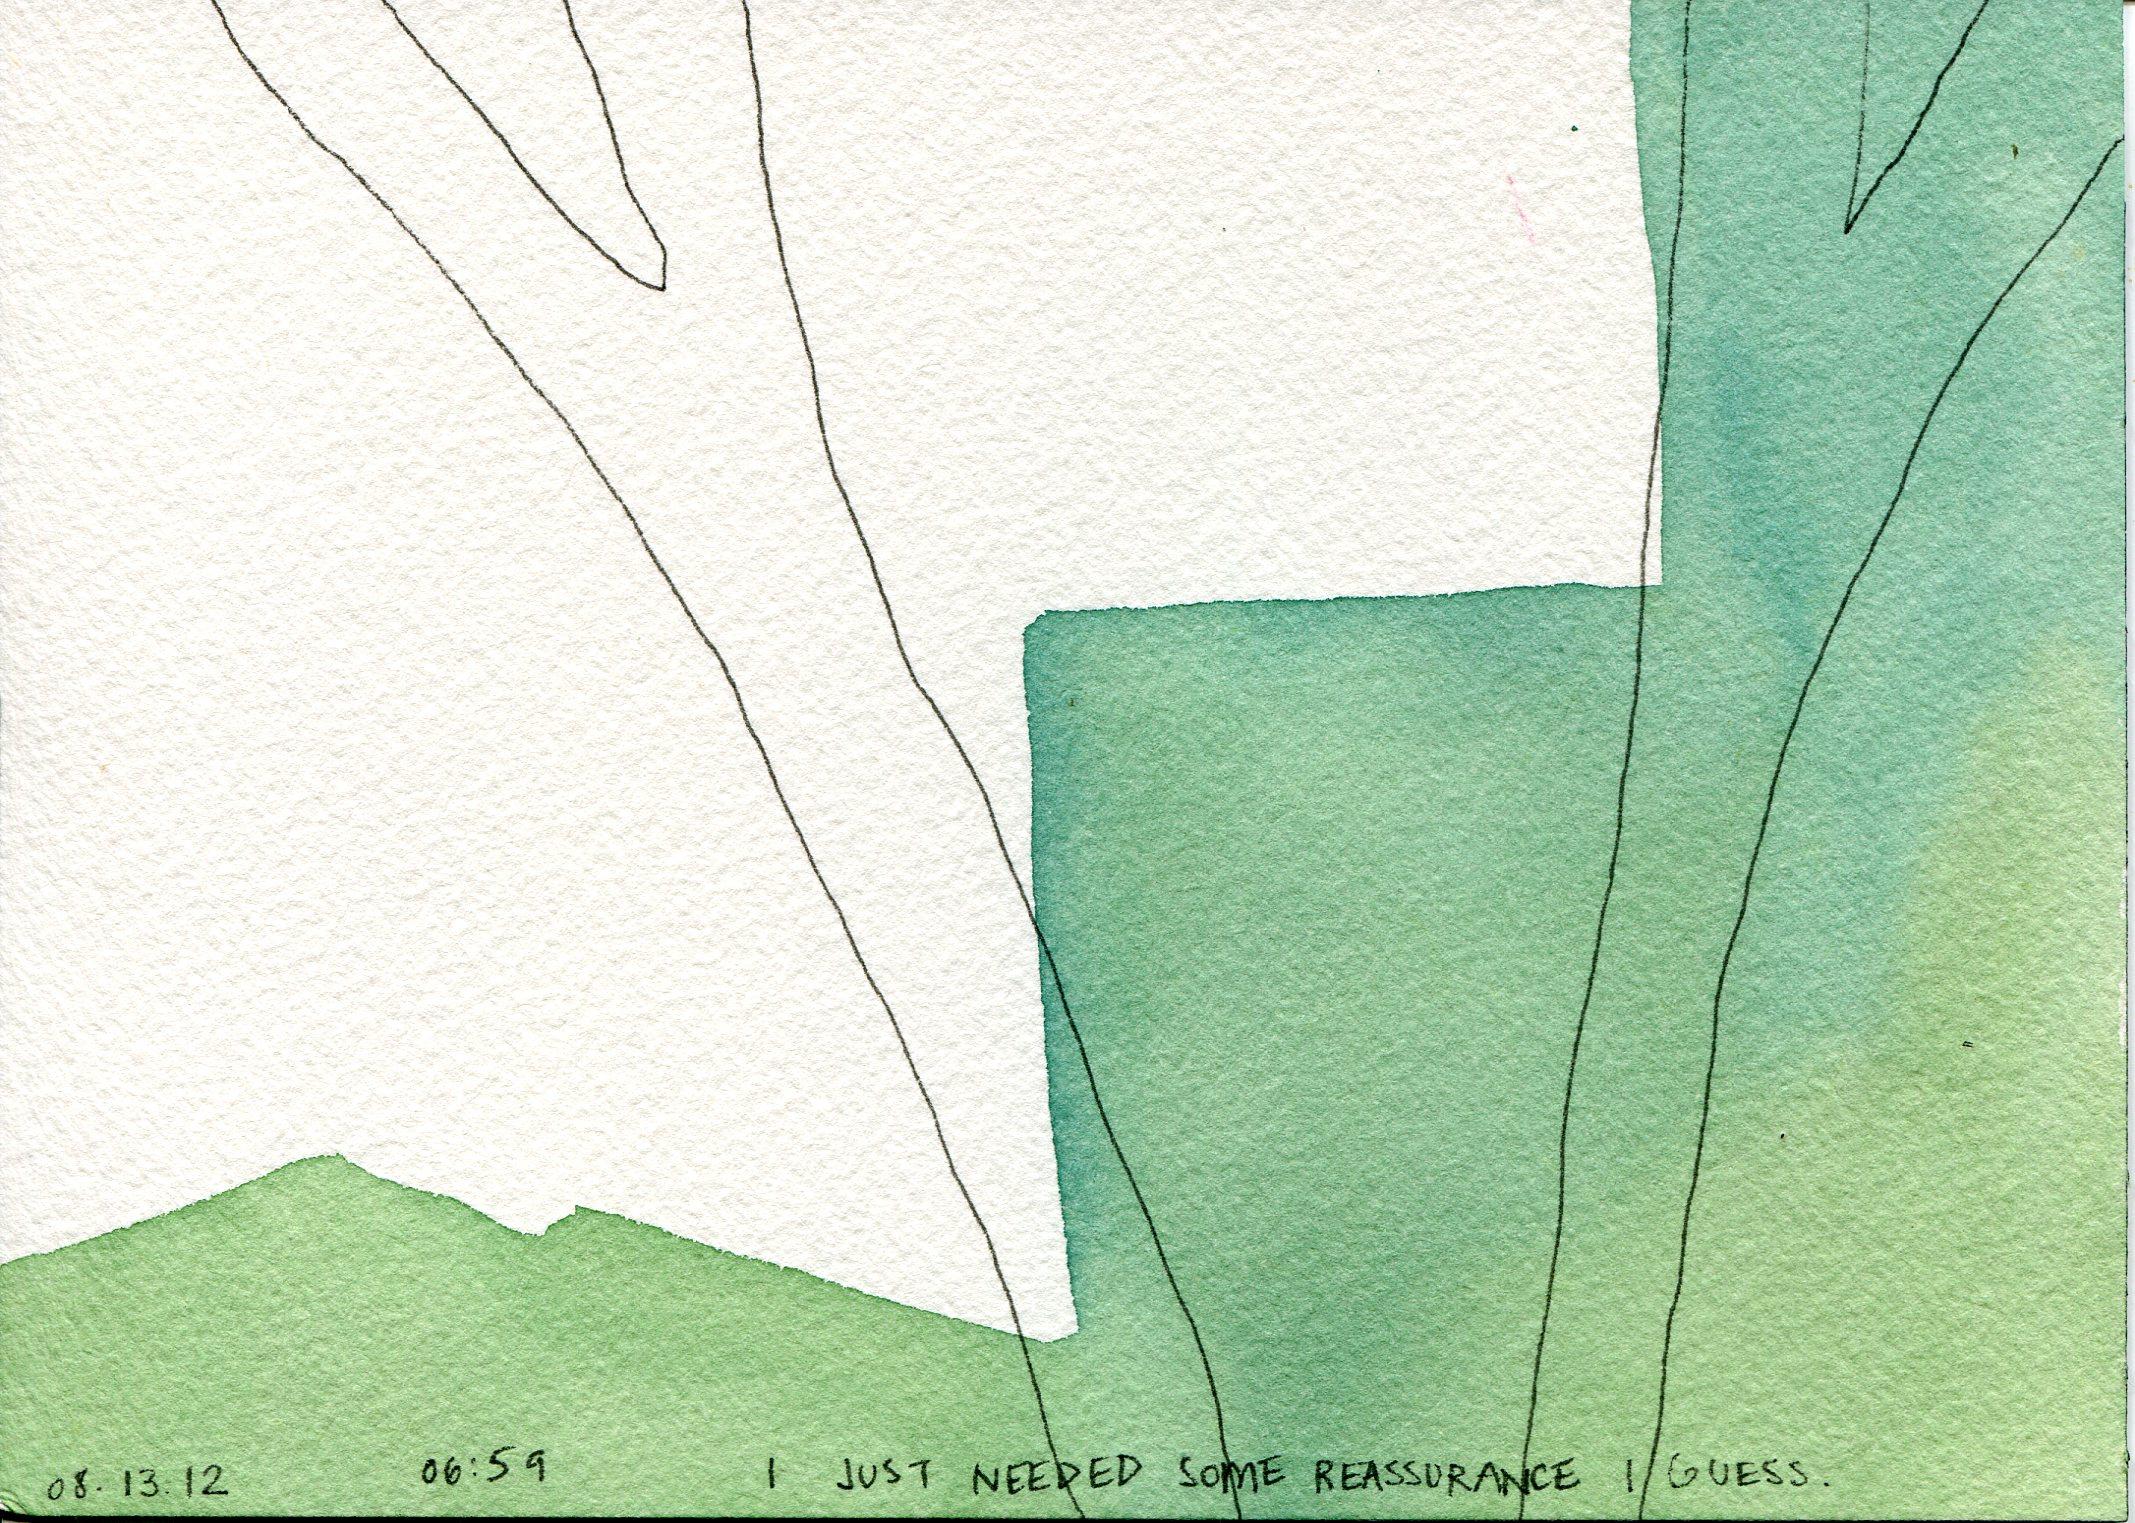 2012-08-13 drawing007.jpg